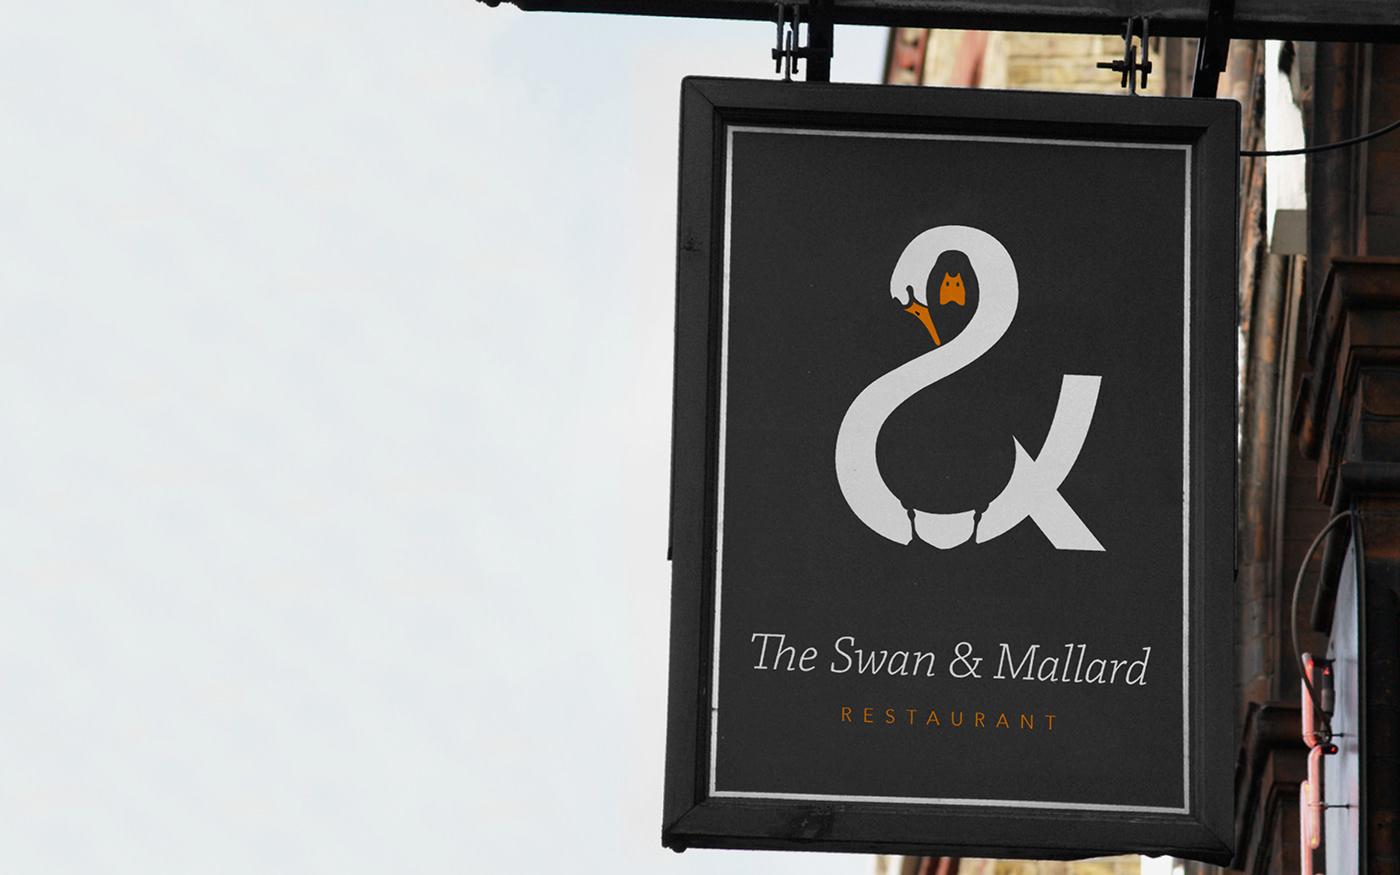 swan,mallard,Nagative,Space ,negative space,pub,restaurant,logo,Double meaning,double,Noma Bar,duck,idea,concept,creative